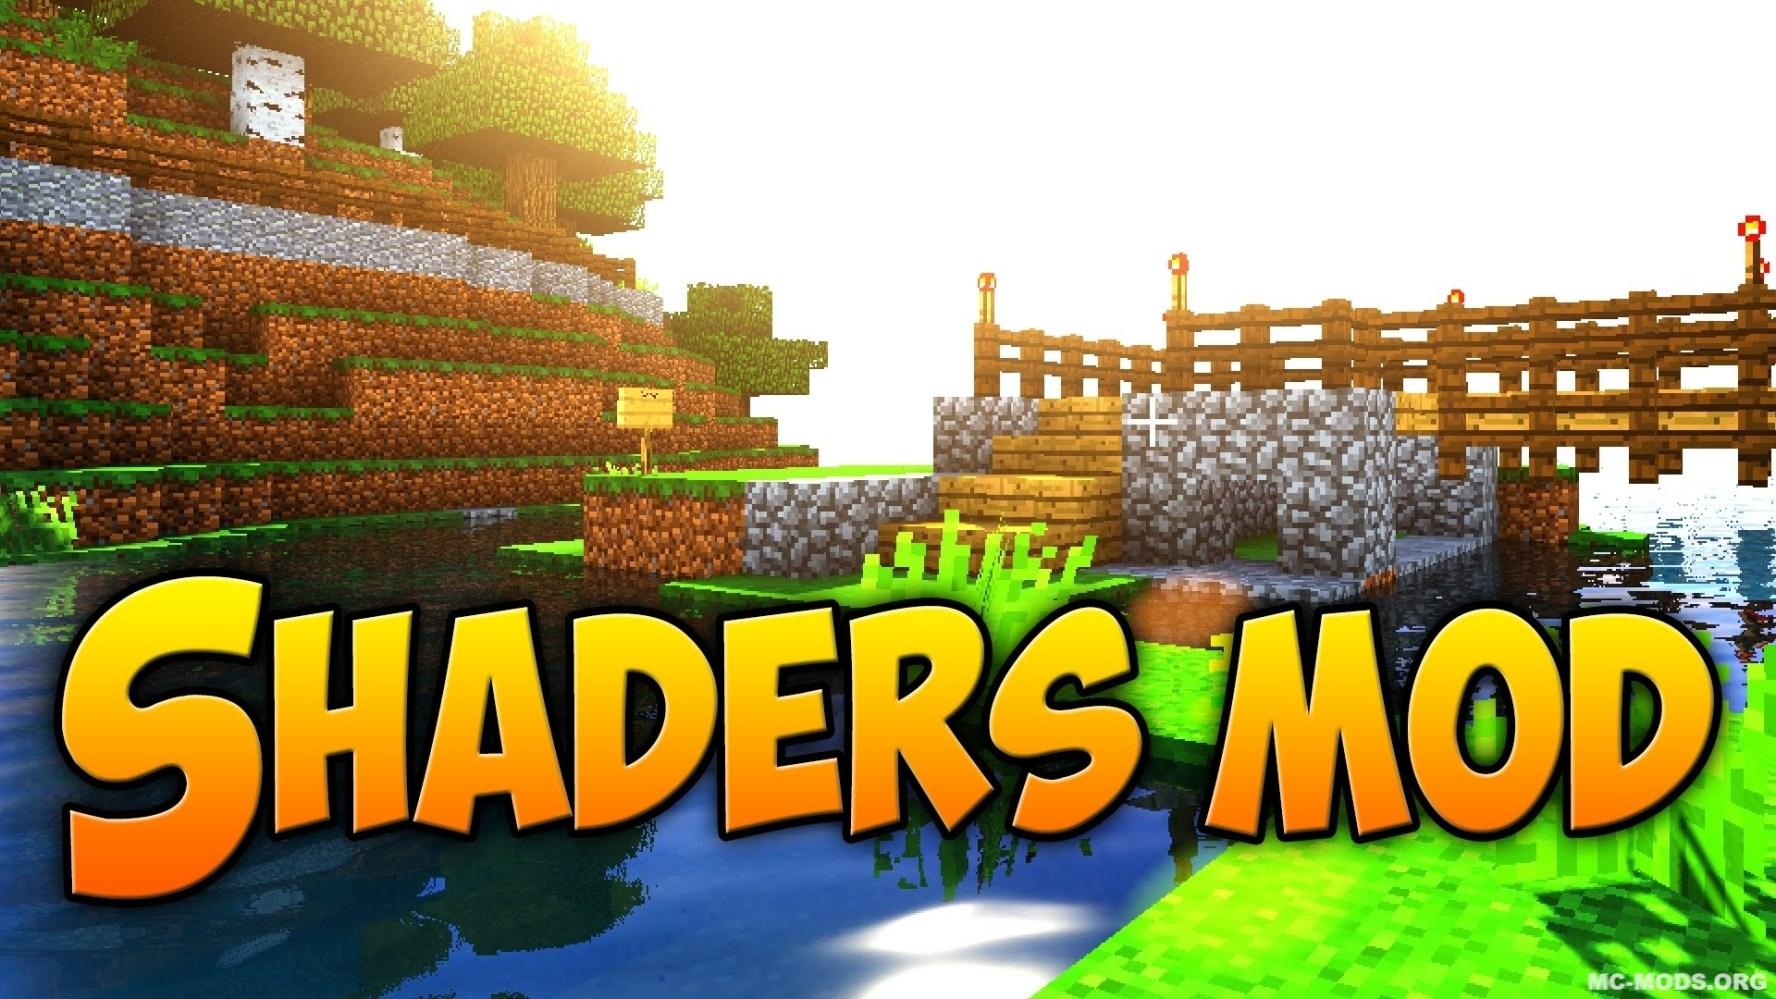 Shaders Mod 10000.100006.10000/10000.100006.1000/10000.1000010000.100/10000.100001000.1000 - MC-Mods.org